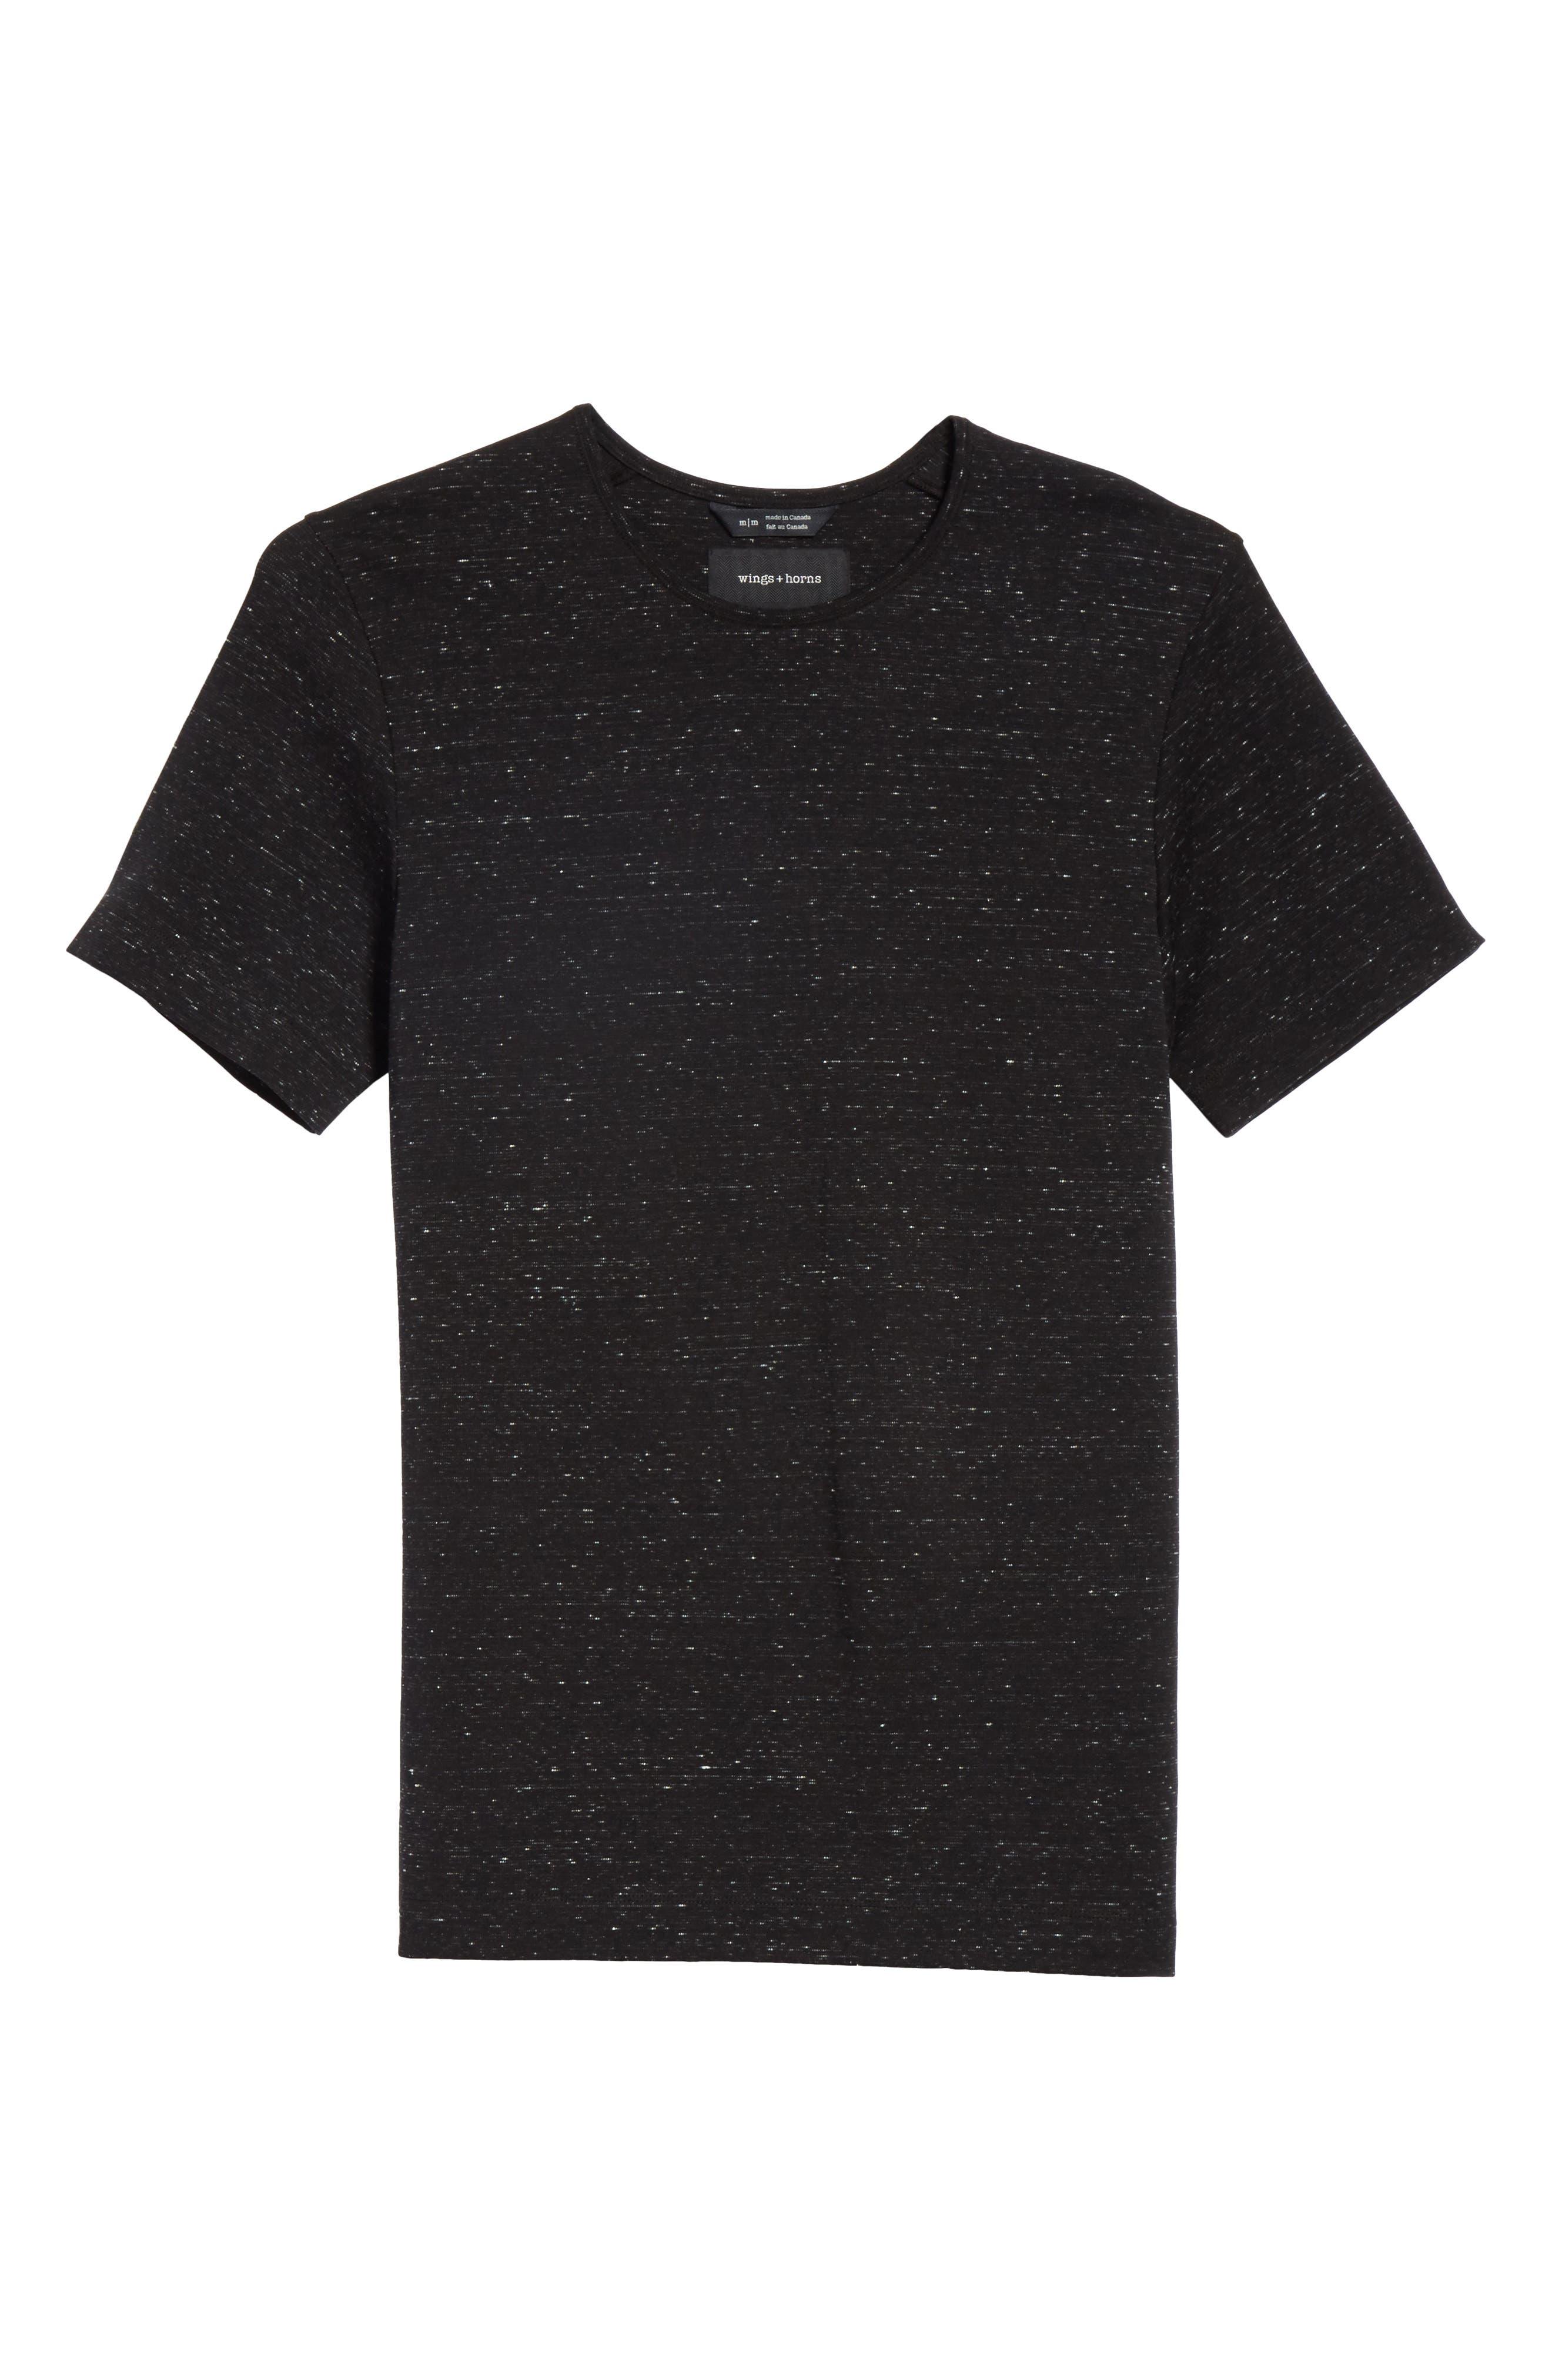 Signals T-Shirt,                             Alternate thumbnail 6, color,                             005